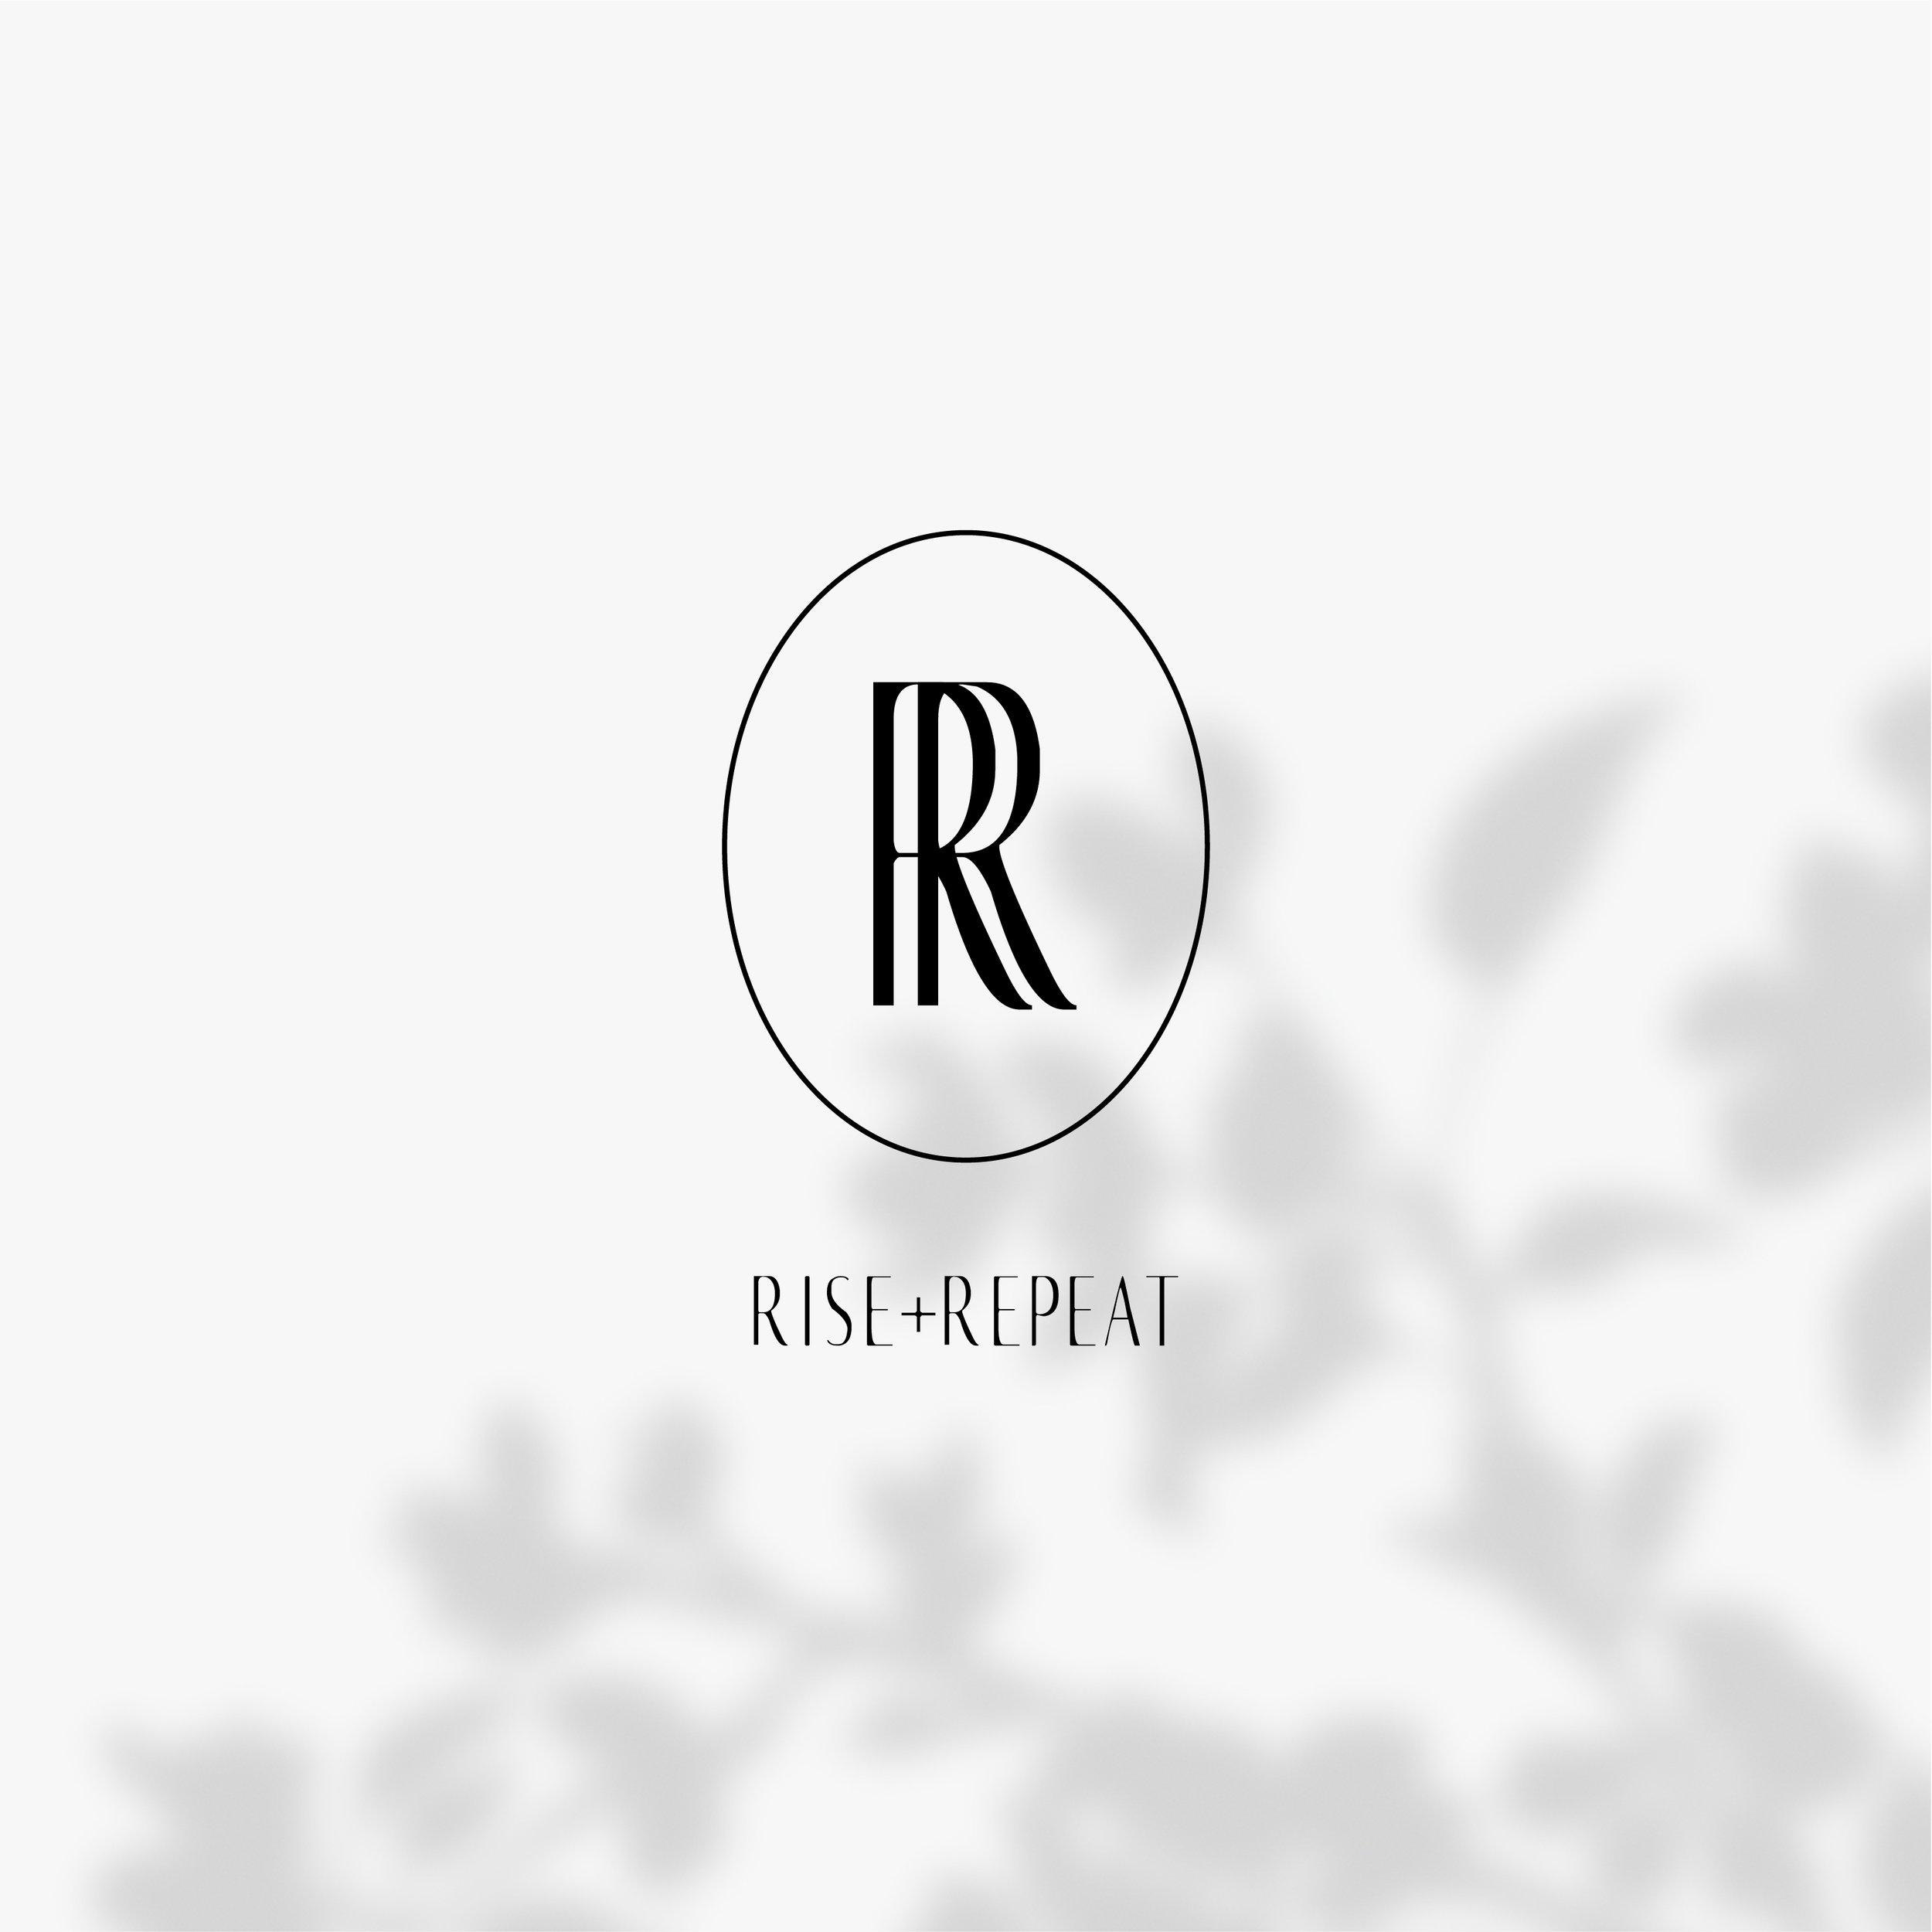 RR-07.jpg